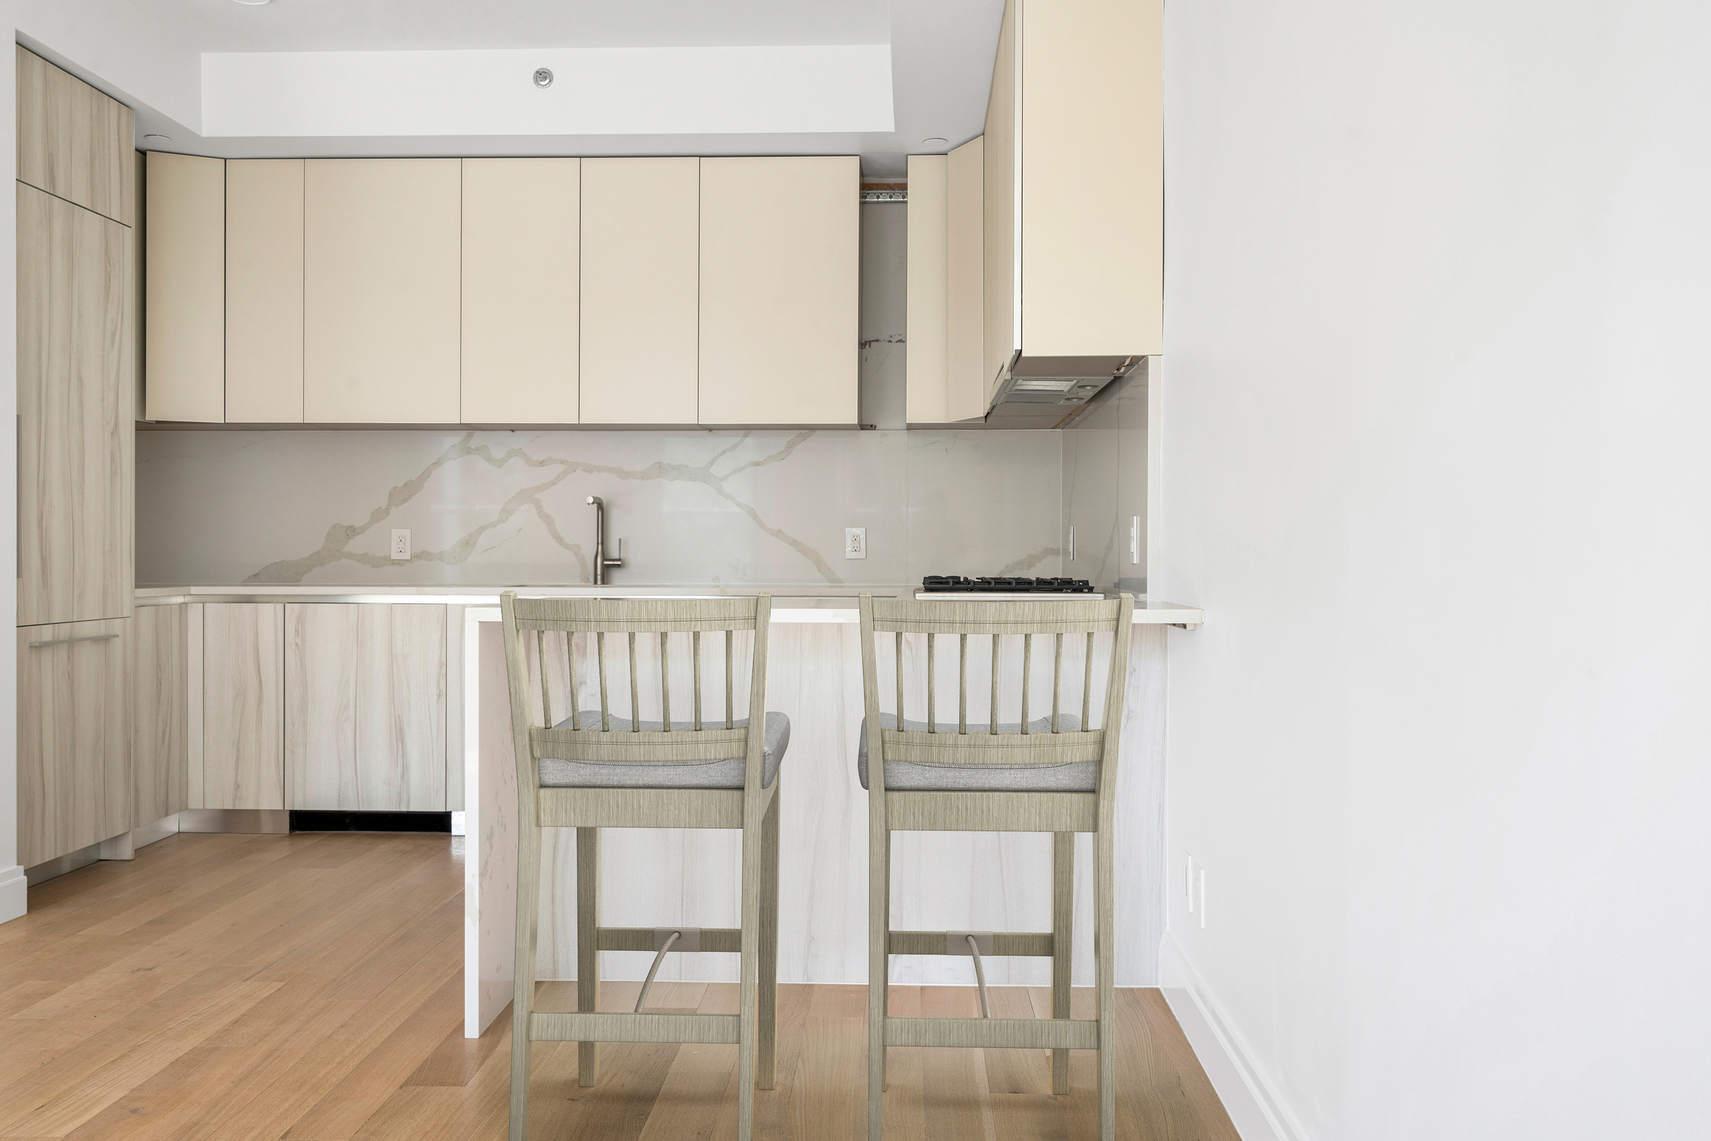 Apartment for sale at 123 Clinton Avenue, Apt 3-A